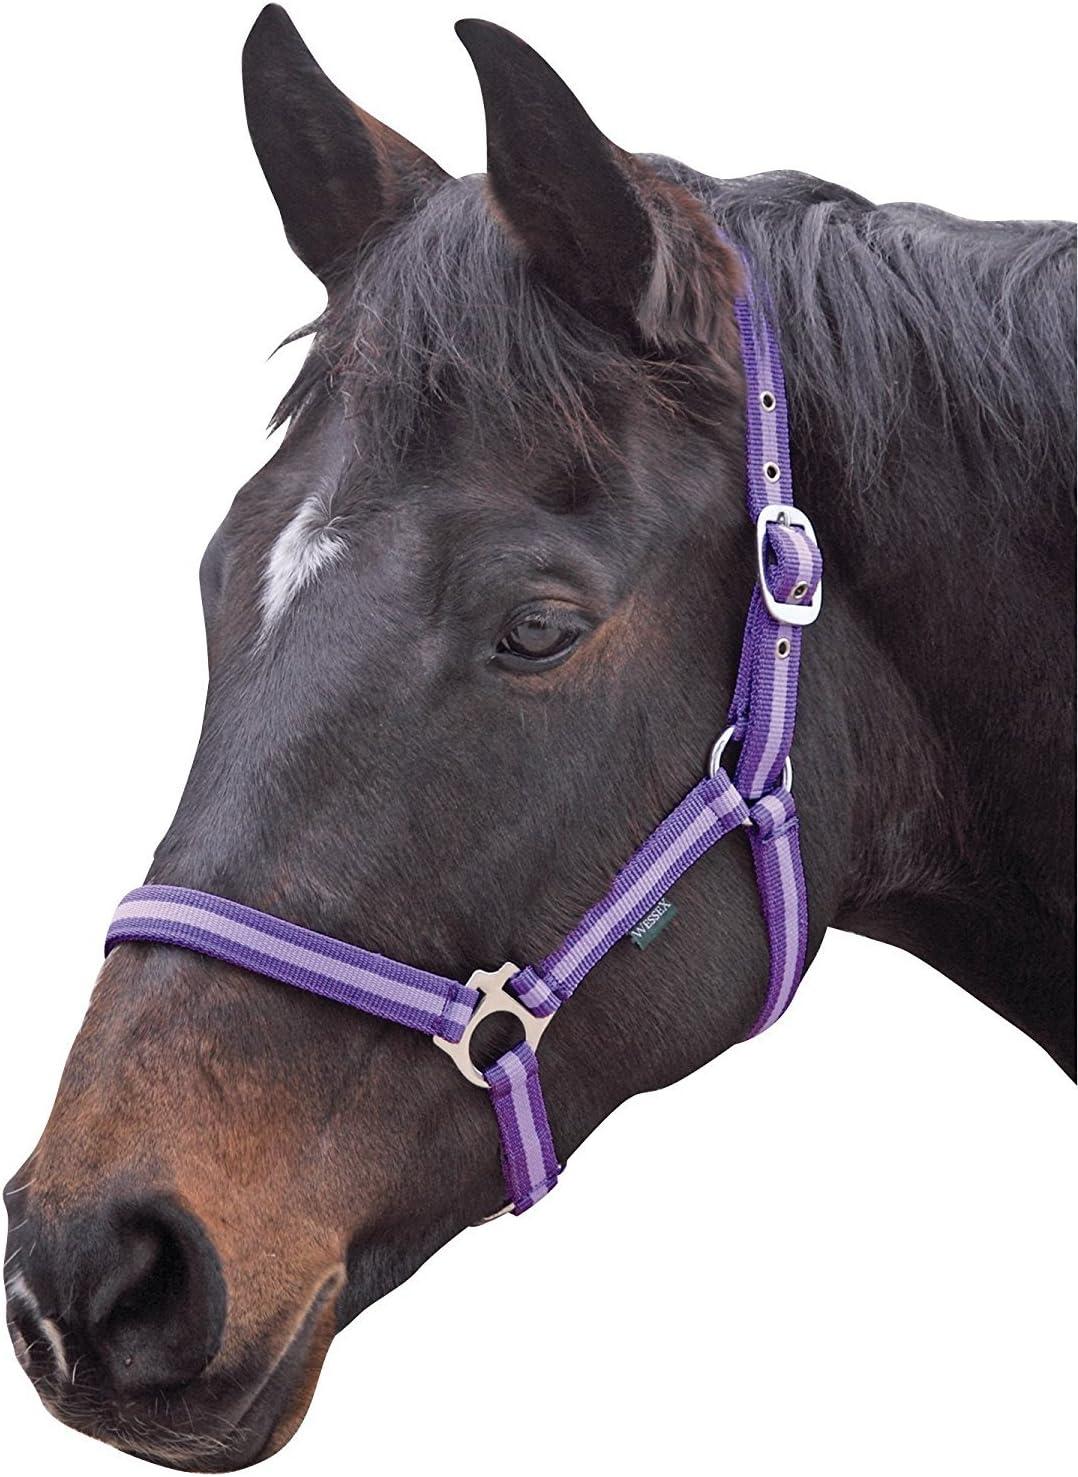 Shires WESSEX NYLON HEADCOLLAR HORSE EQUESTRIAN RIDING TACK HANDLING